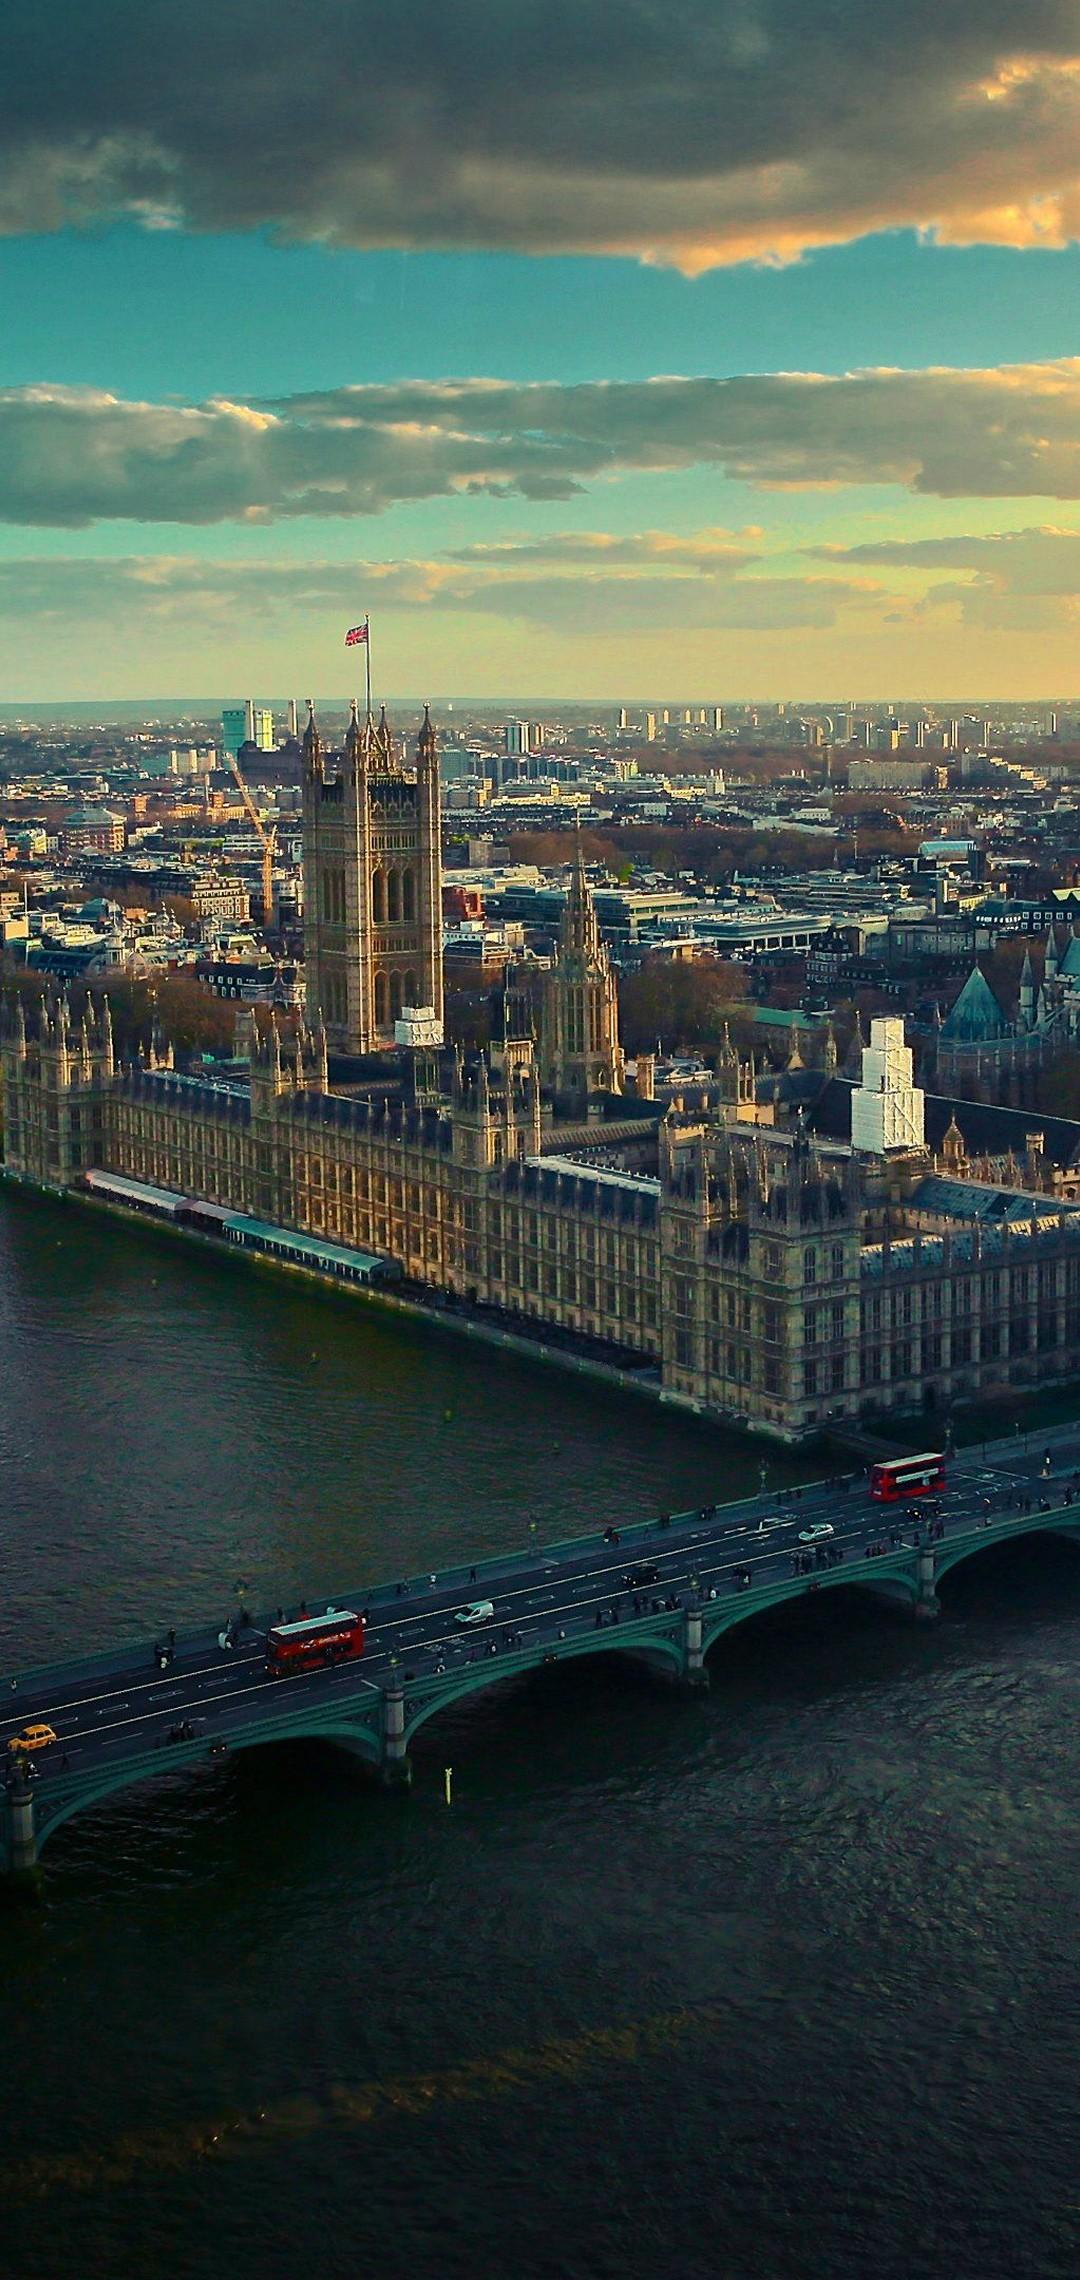 London wallpaper 1080x2280 - 1080 x 1080 background ...